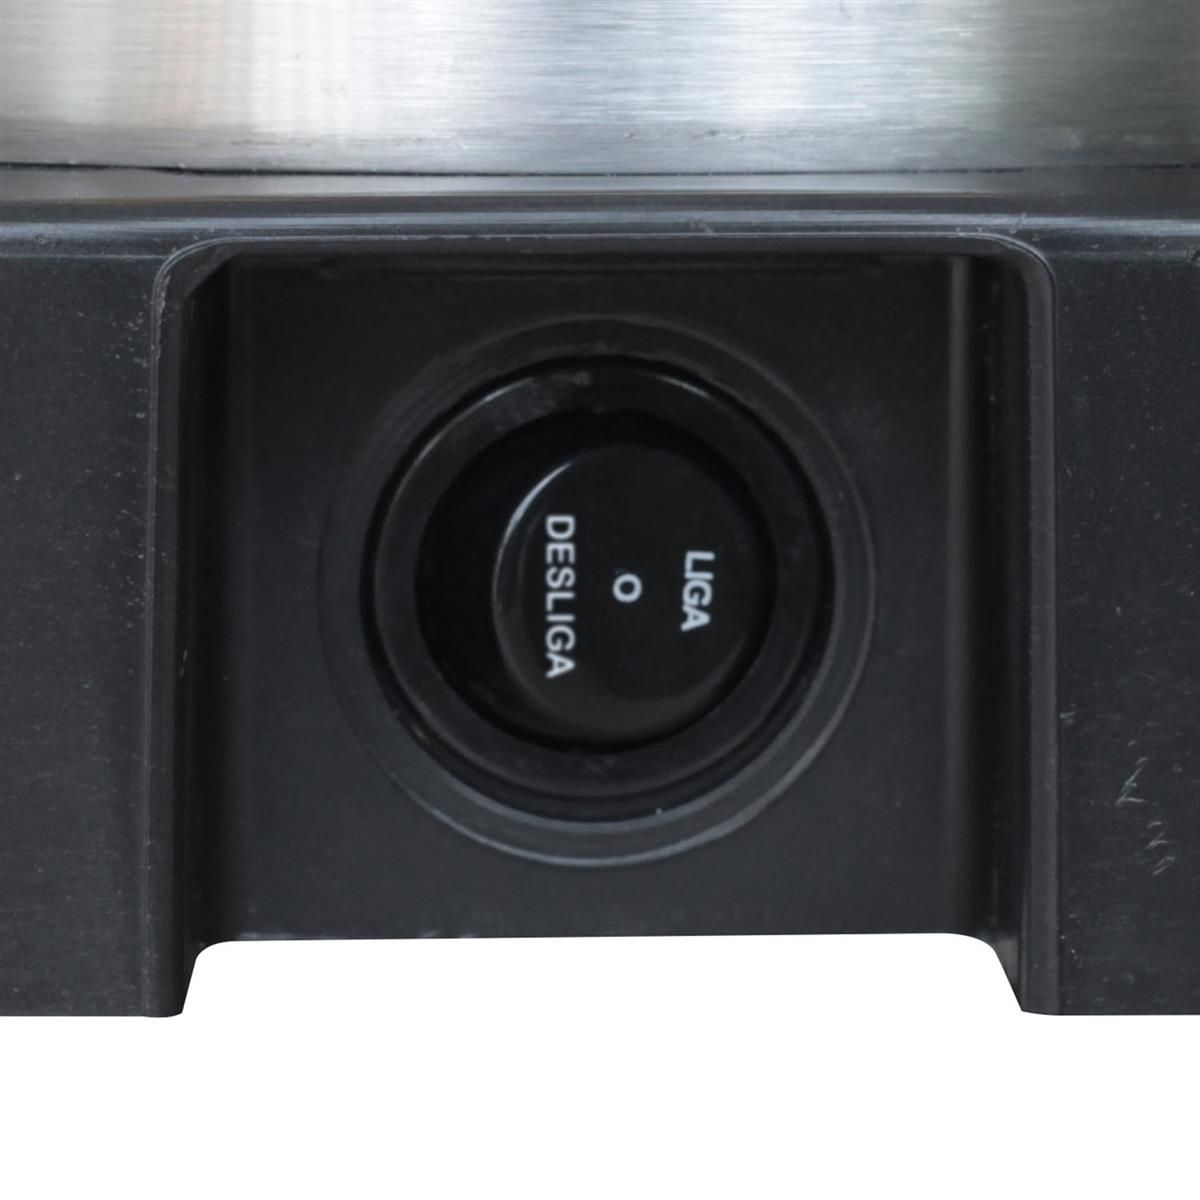 Espremedor de Frutas Industrial Bivolt 1/4 Cv - 245 W - SPL-007 - Spolu